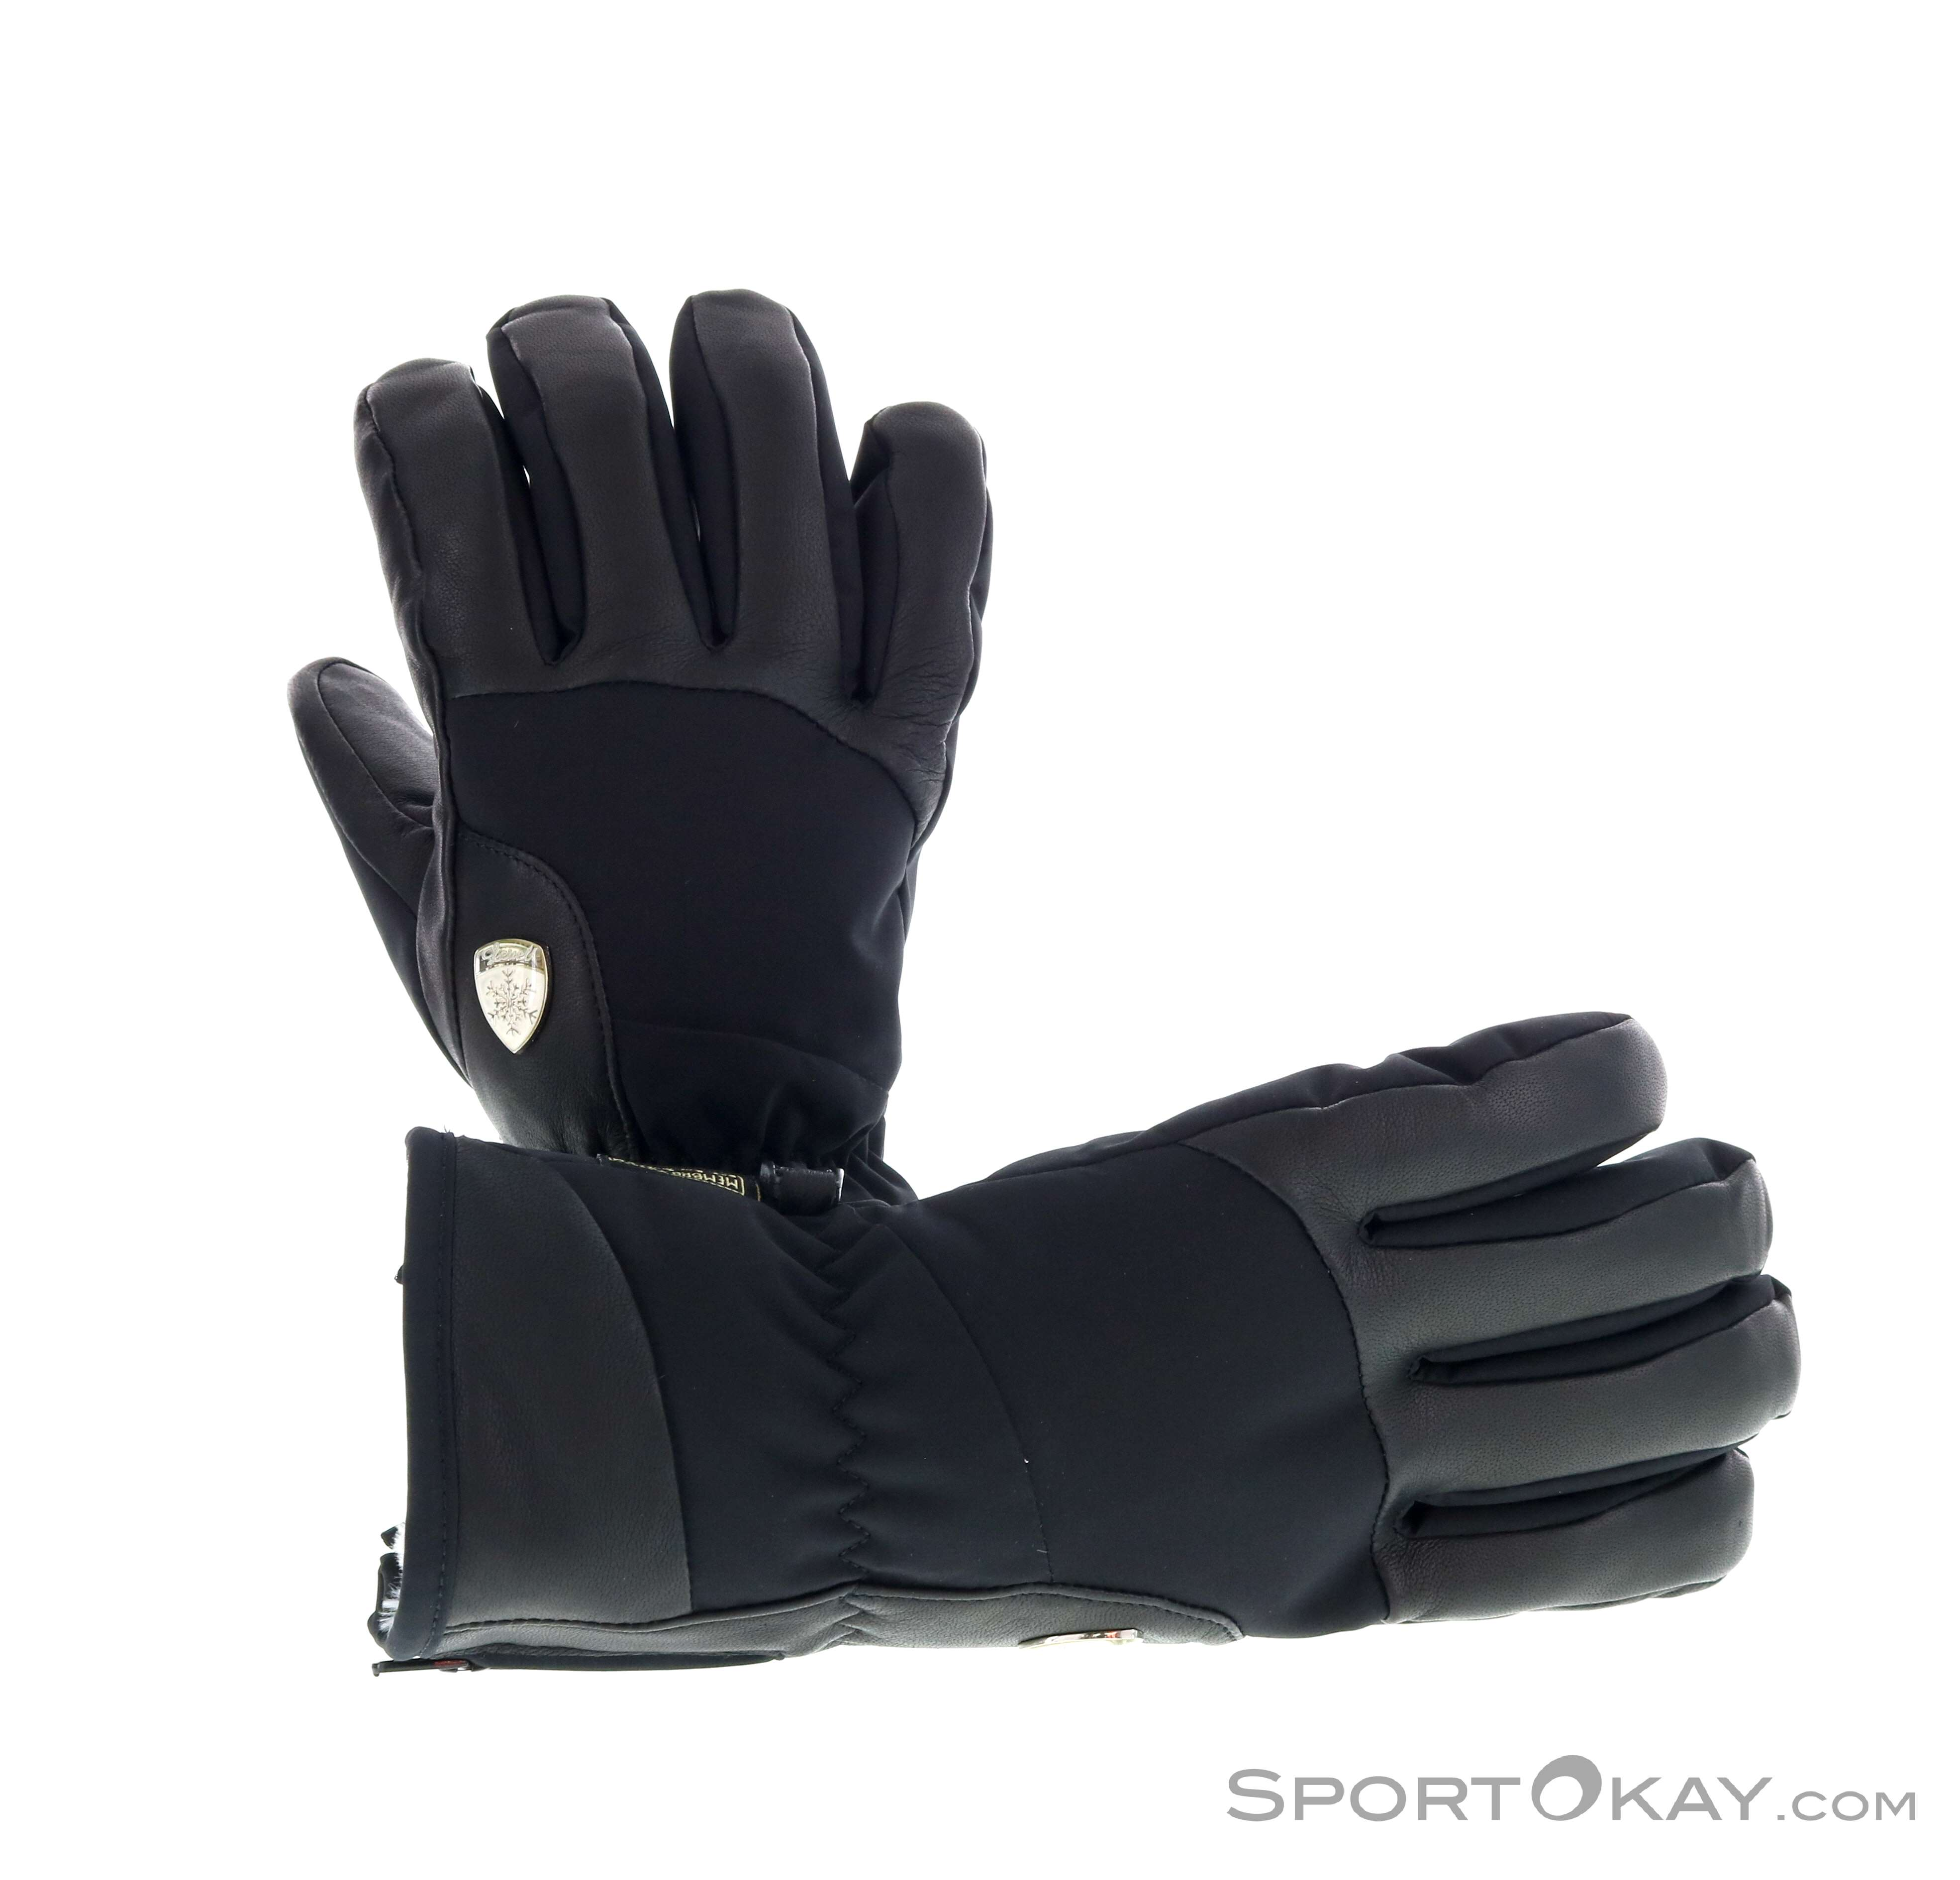 Level Iris Handschuhe-Schwarz-6,5